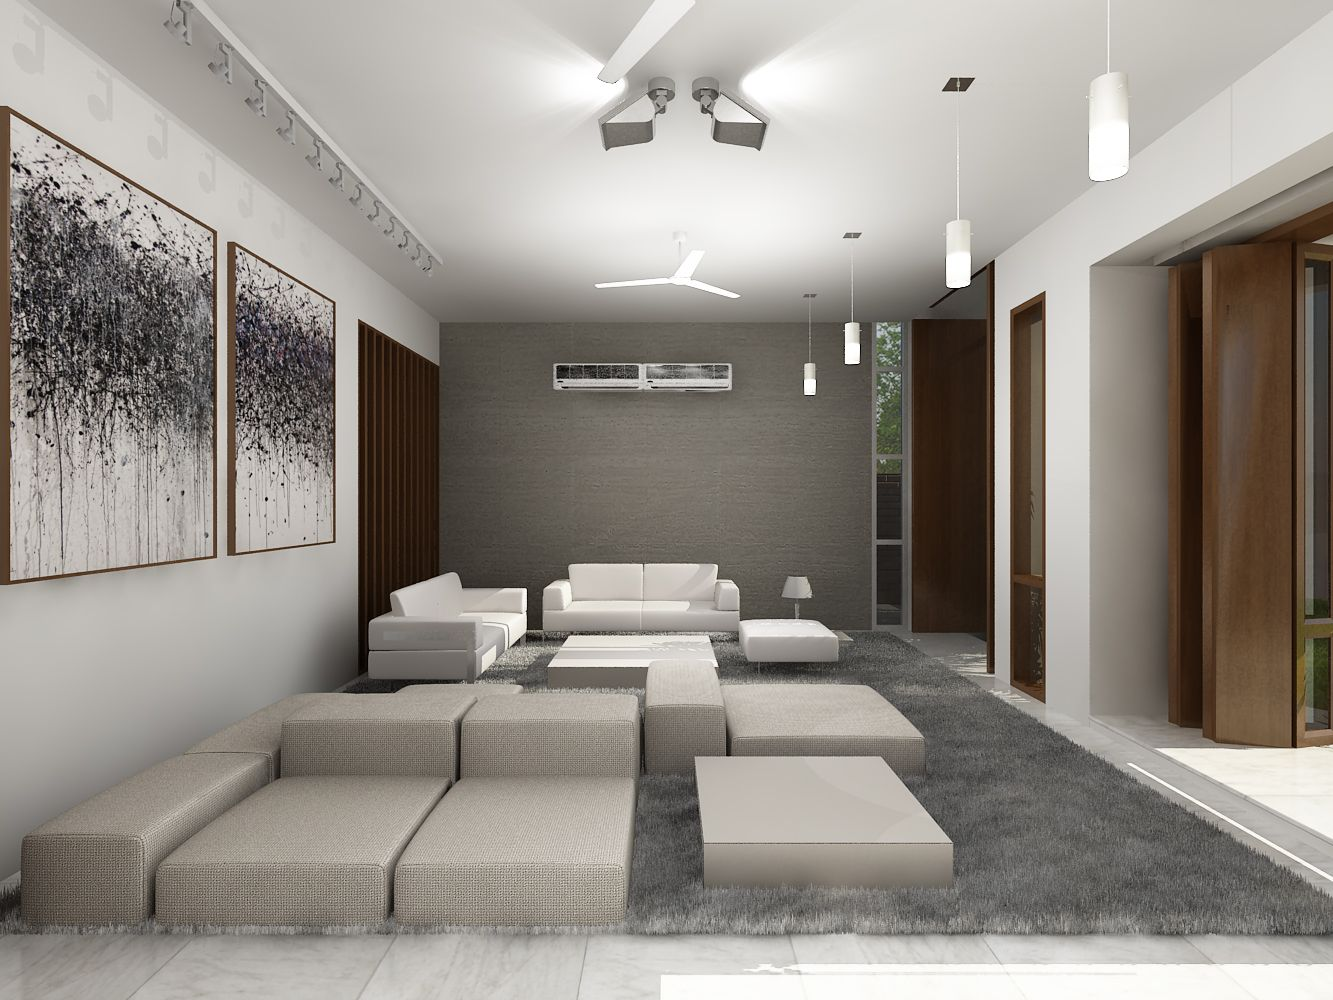 Evangel architect top interior design firm in bangladesh